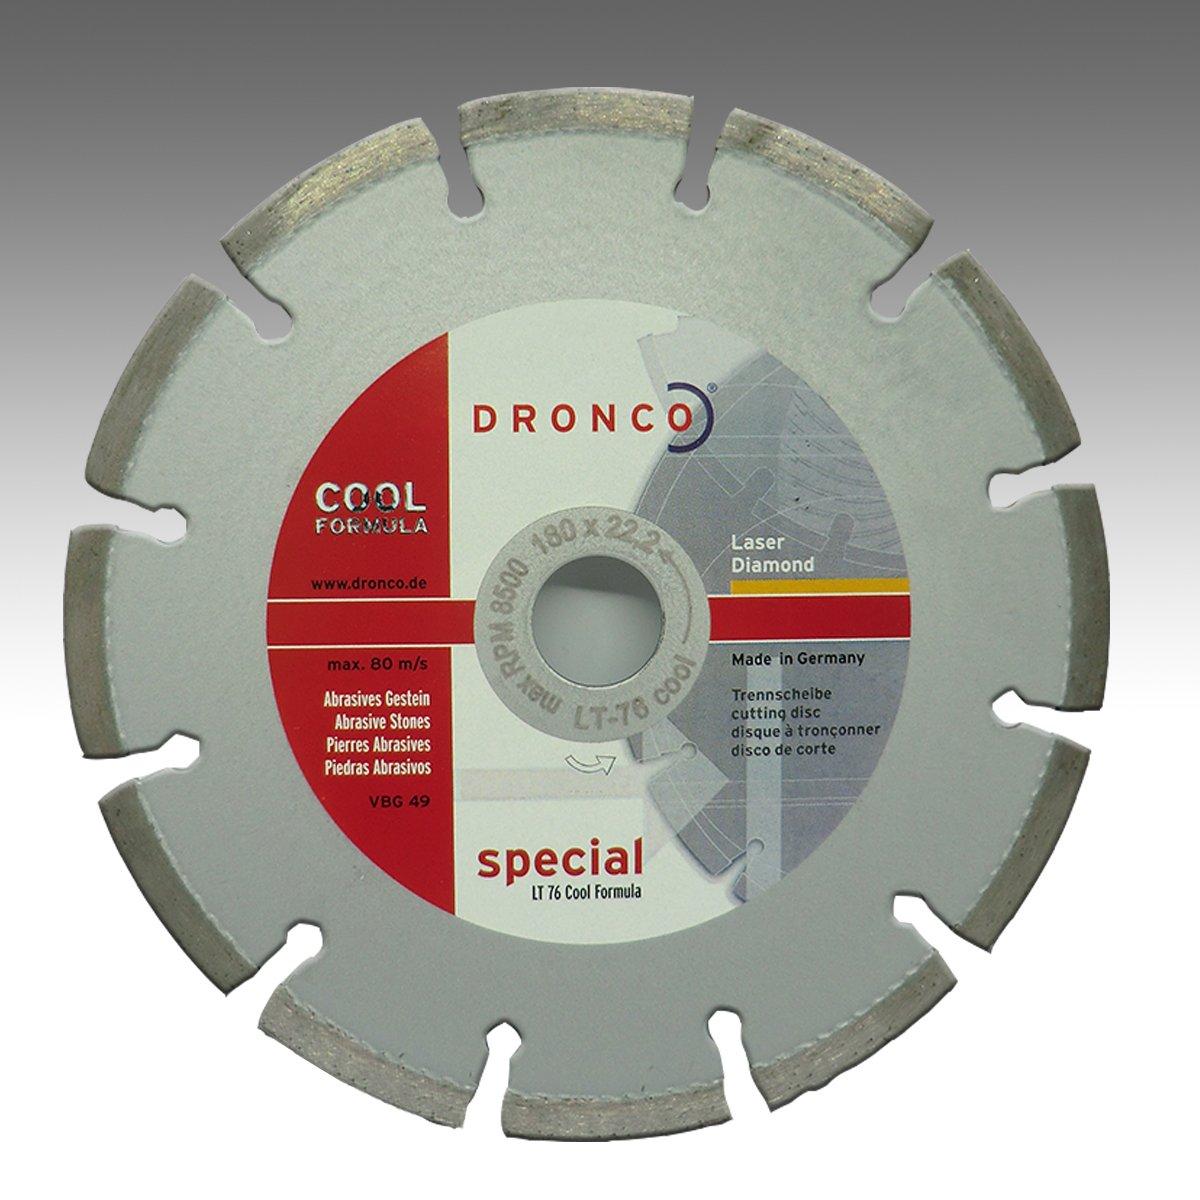 ... lt76 Disco de diamante especial para materiales Abrasive como cal arenisca pavimento Putz arenisca Gas hormigón ladrillo o techo Sartenes - BOSCH ...